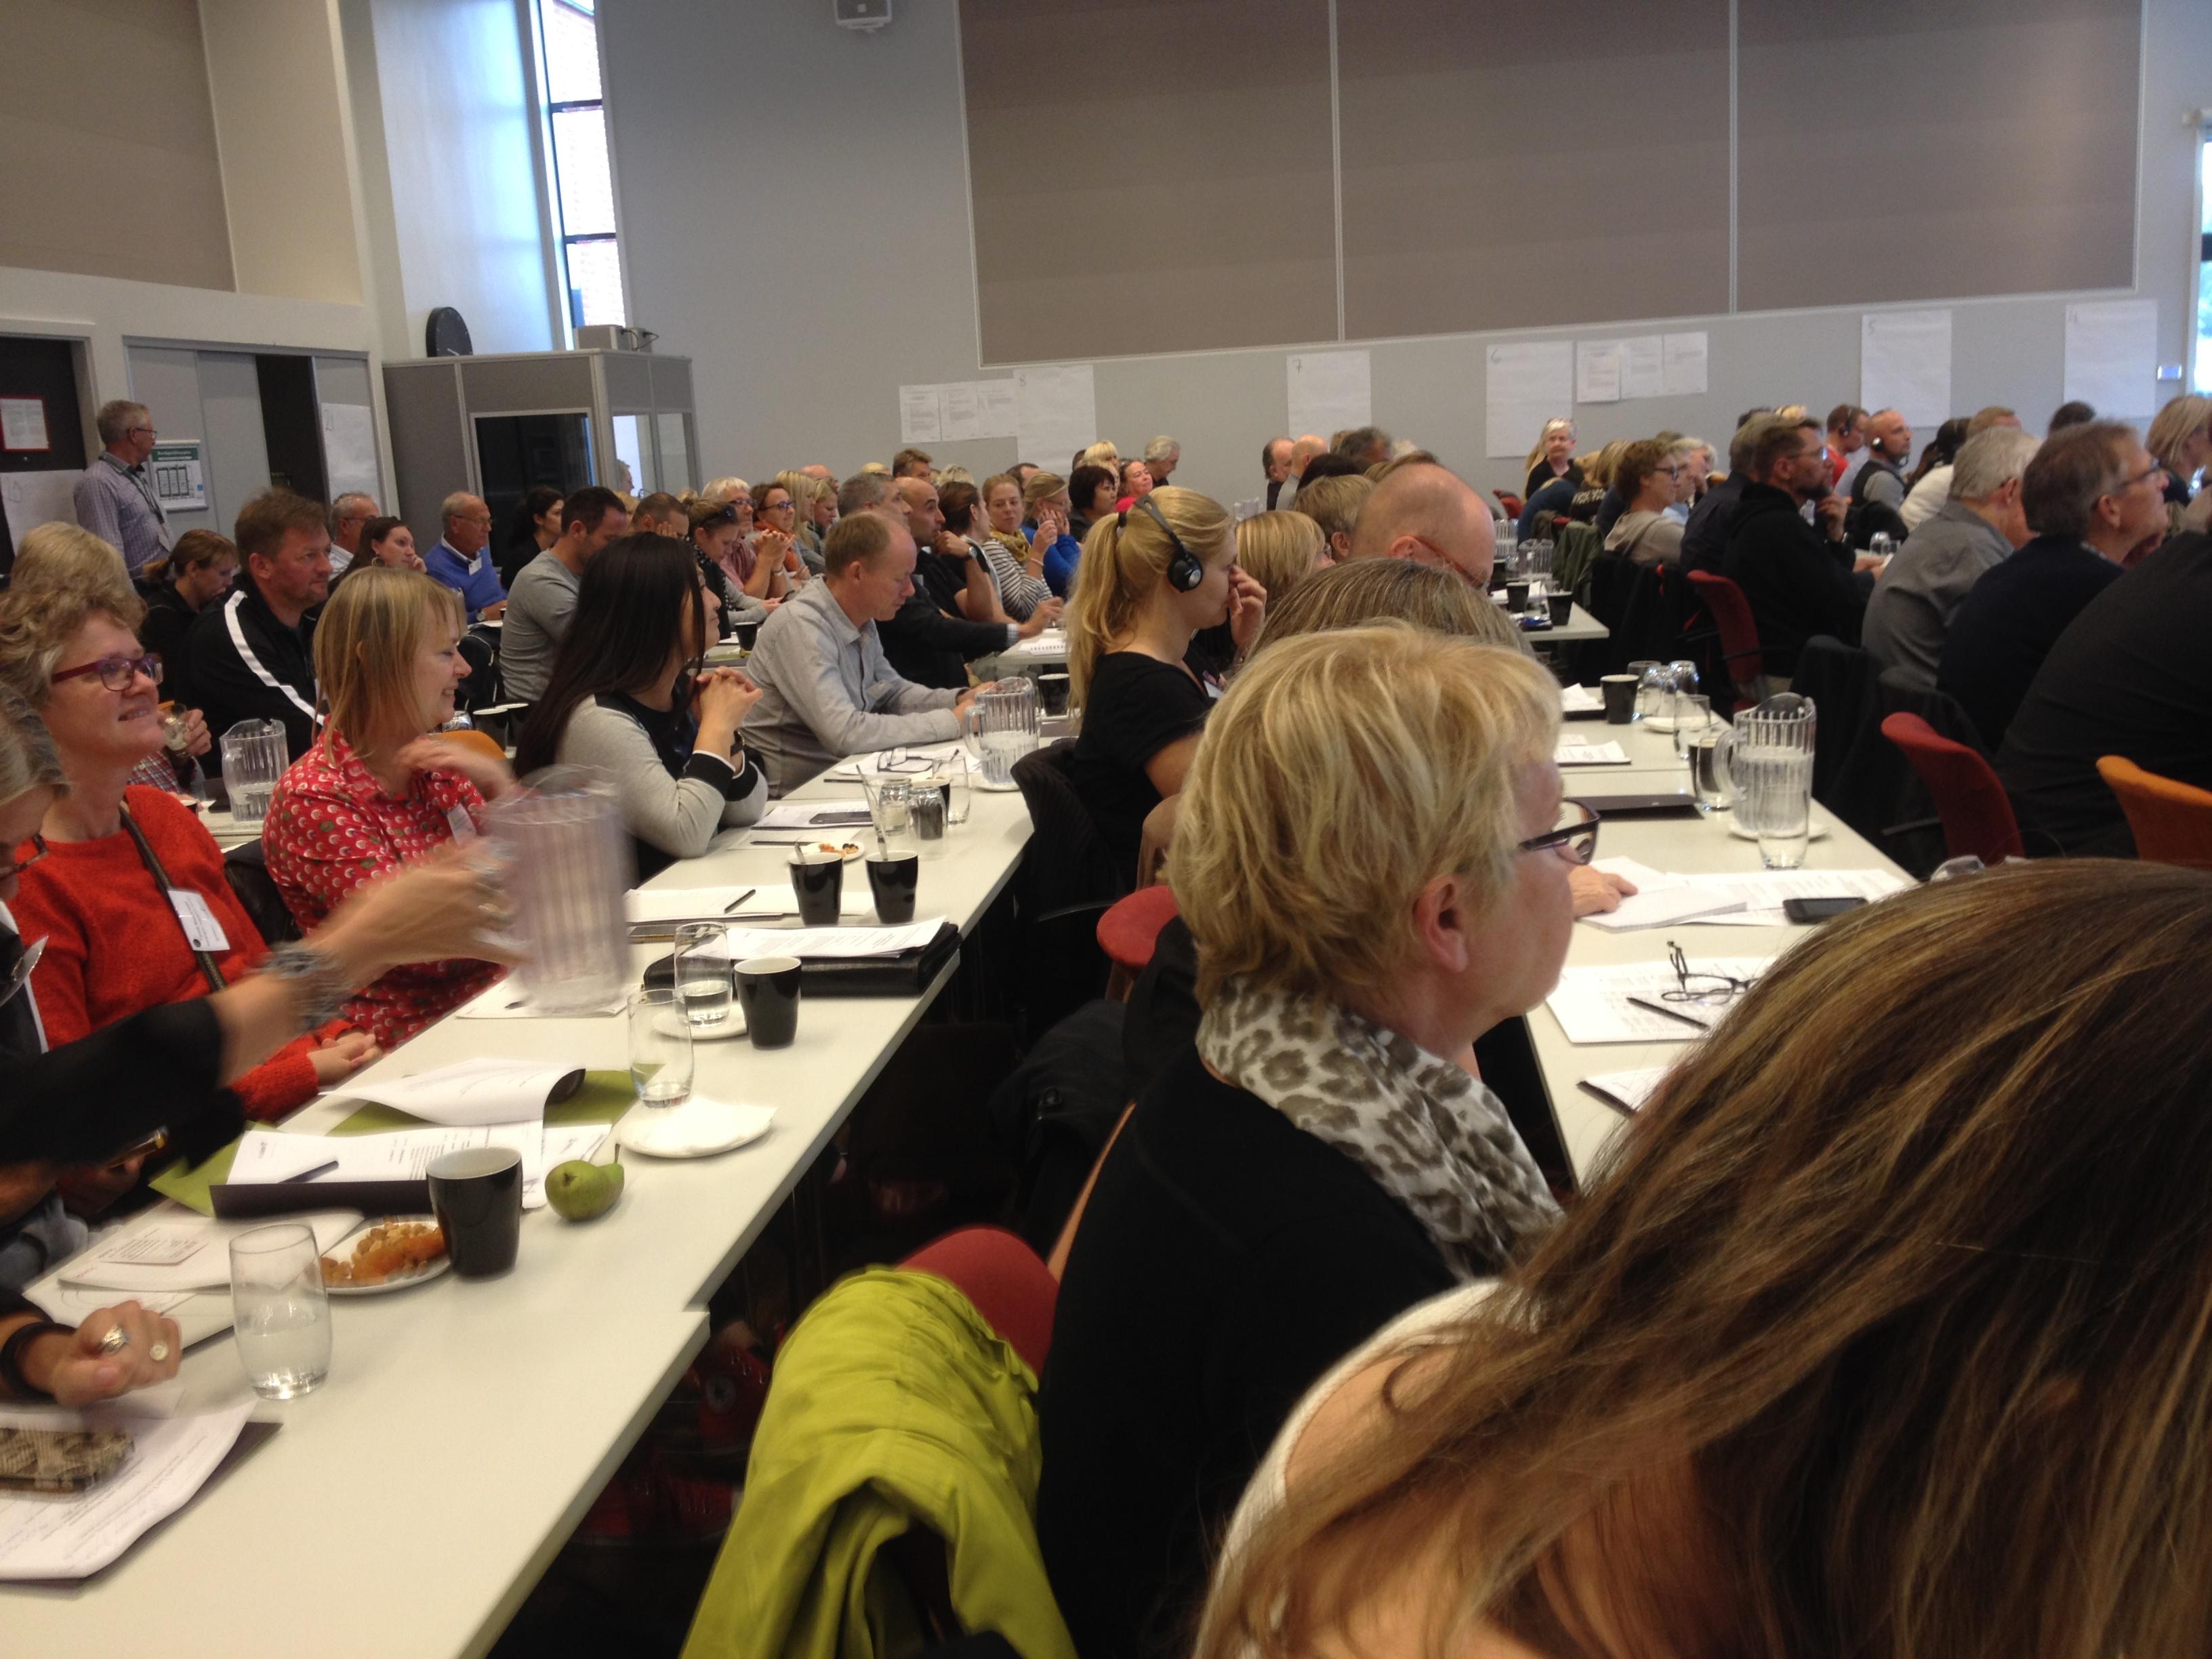 Vellykket nordisk konferanse